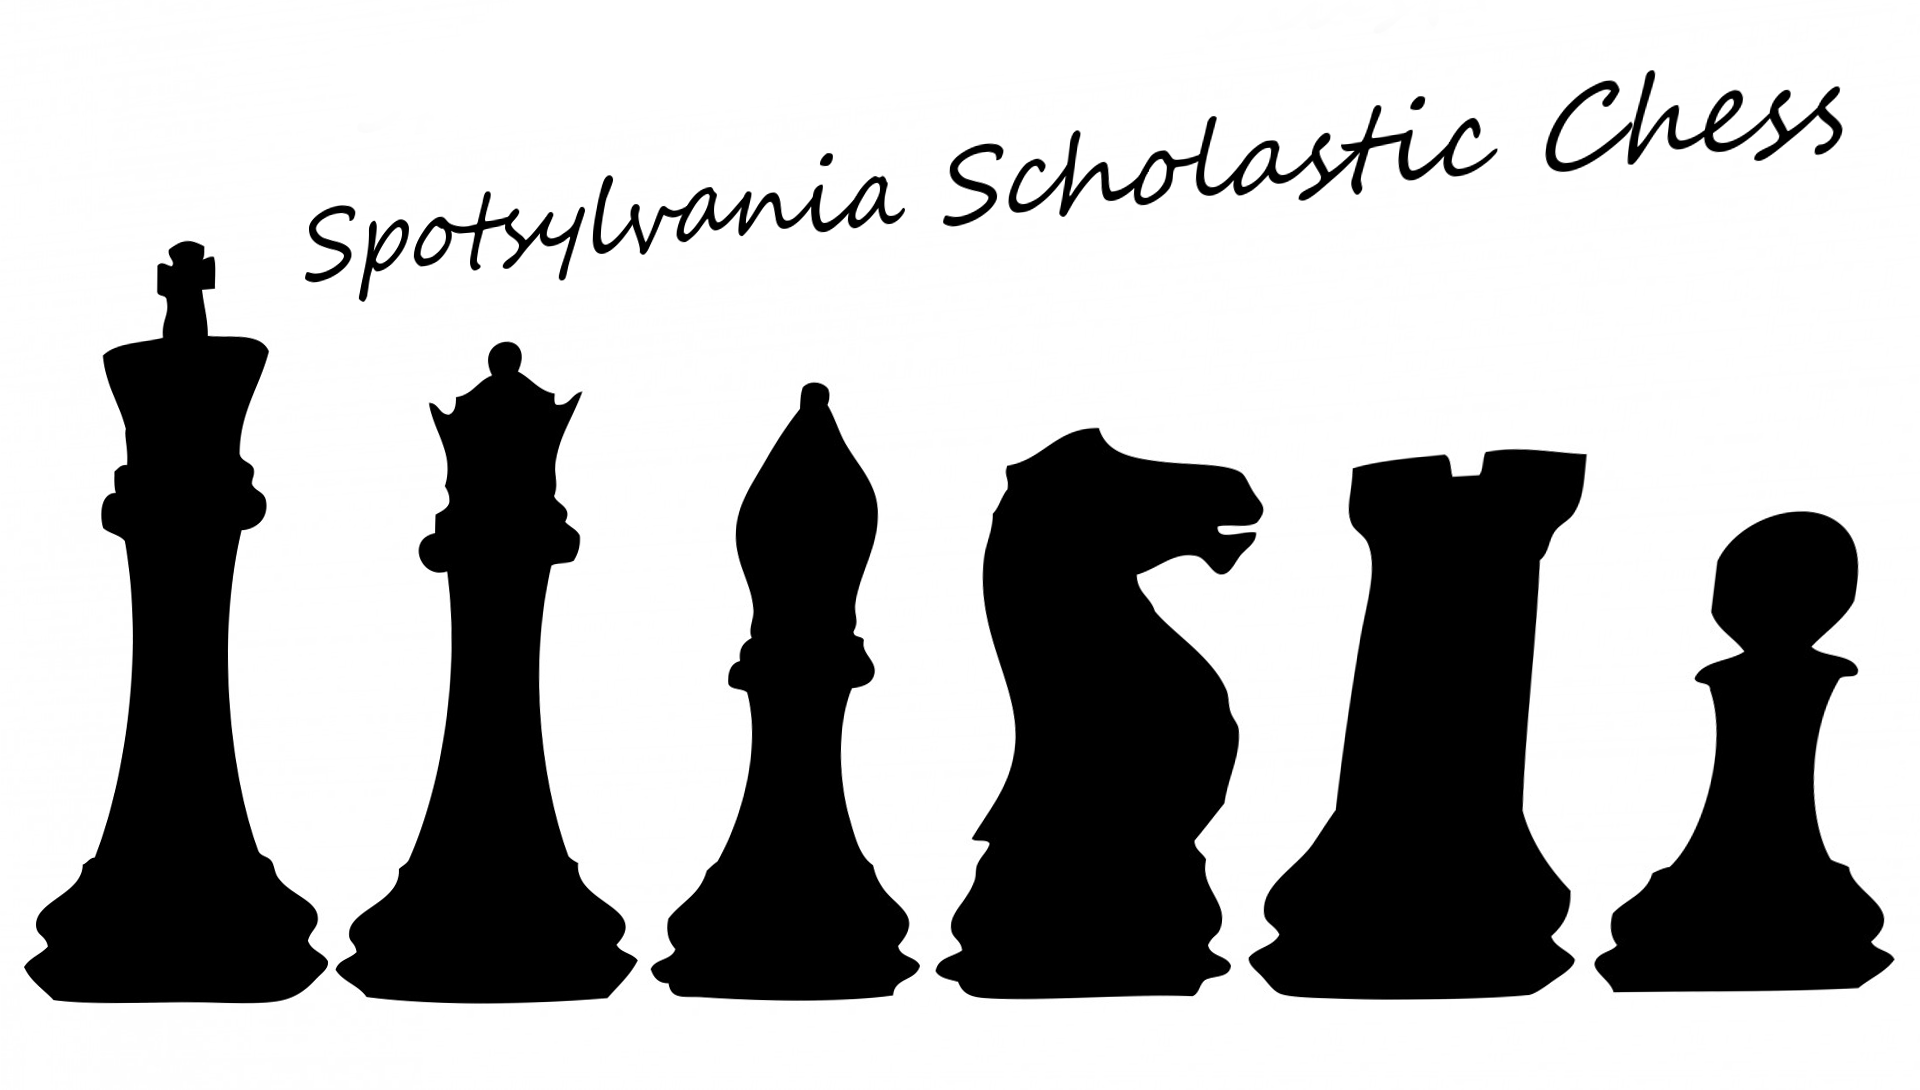 Chess clipart word. Spotsylvania serving the community